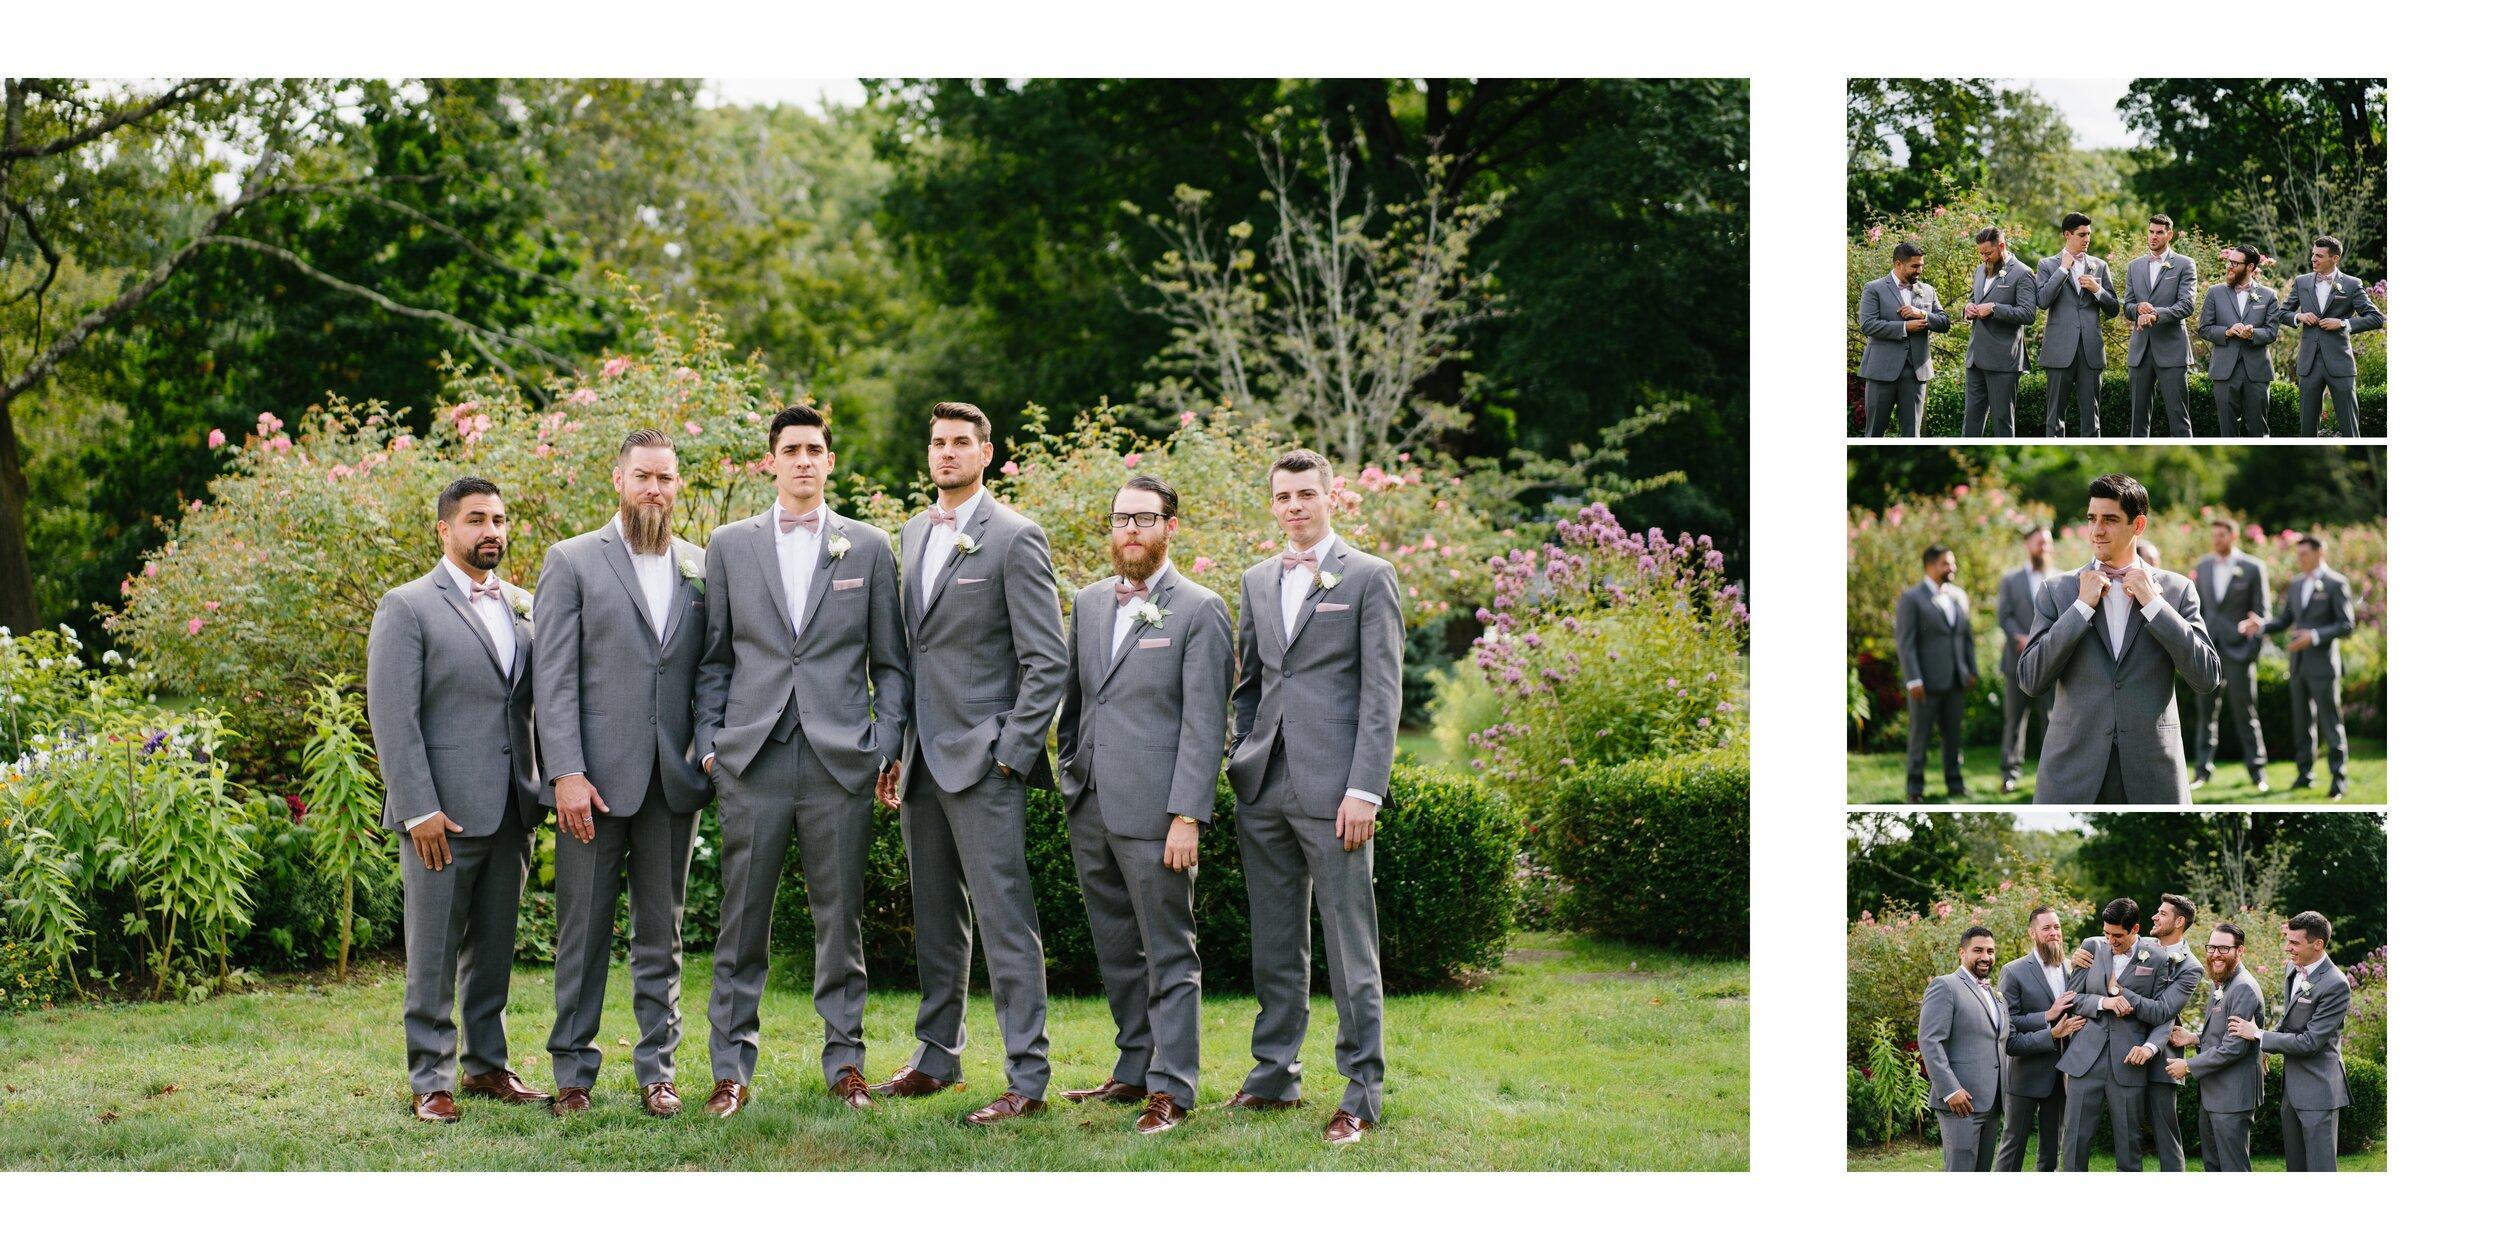 groomsmen at wedding at Lounsbury house